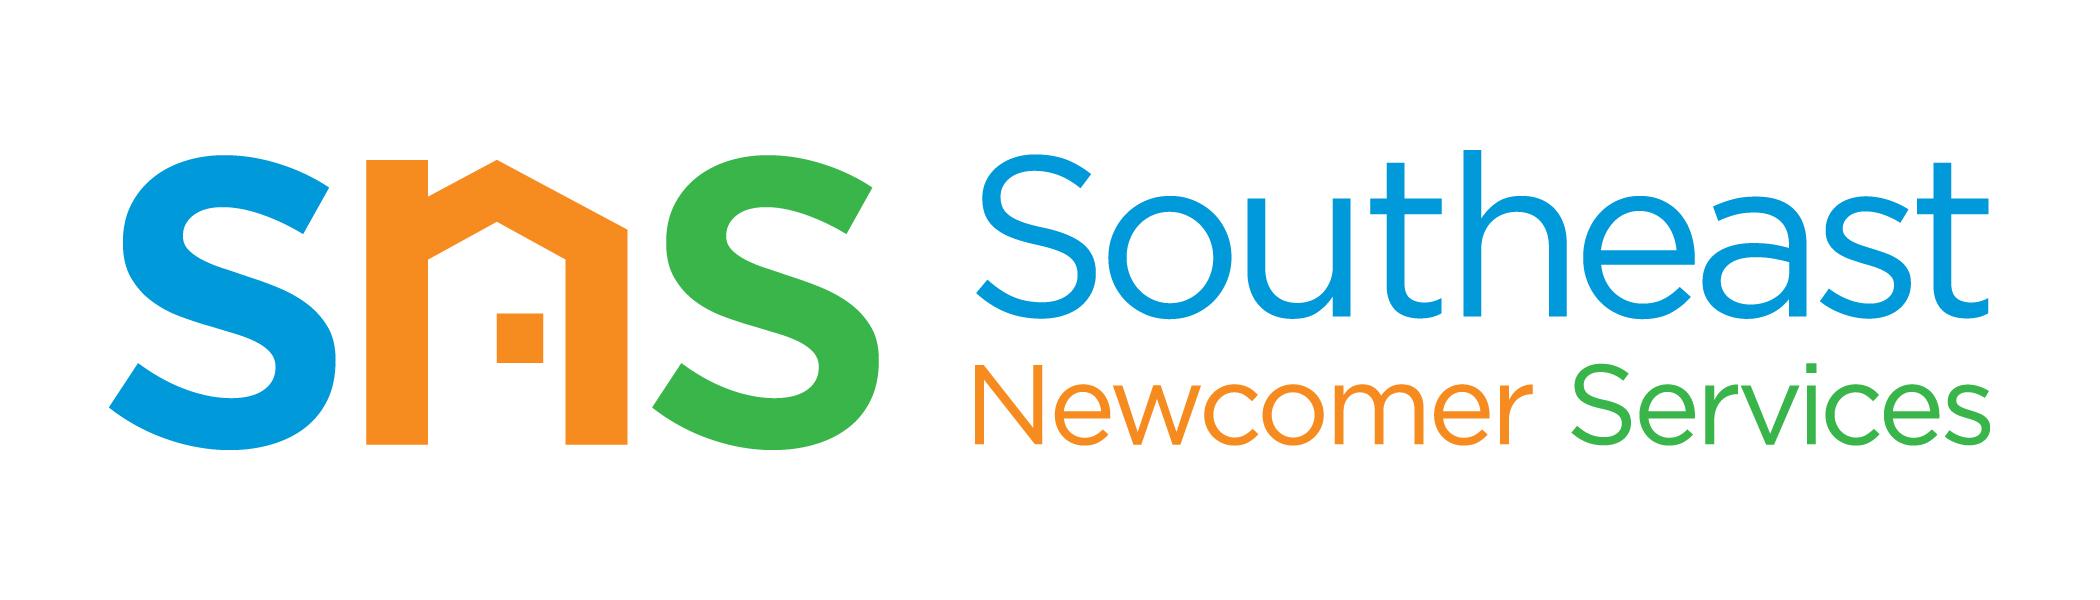 sns_logo_colour_lrg copy 2.jpg